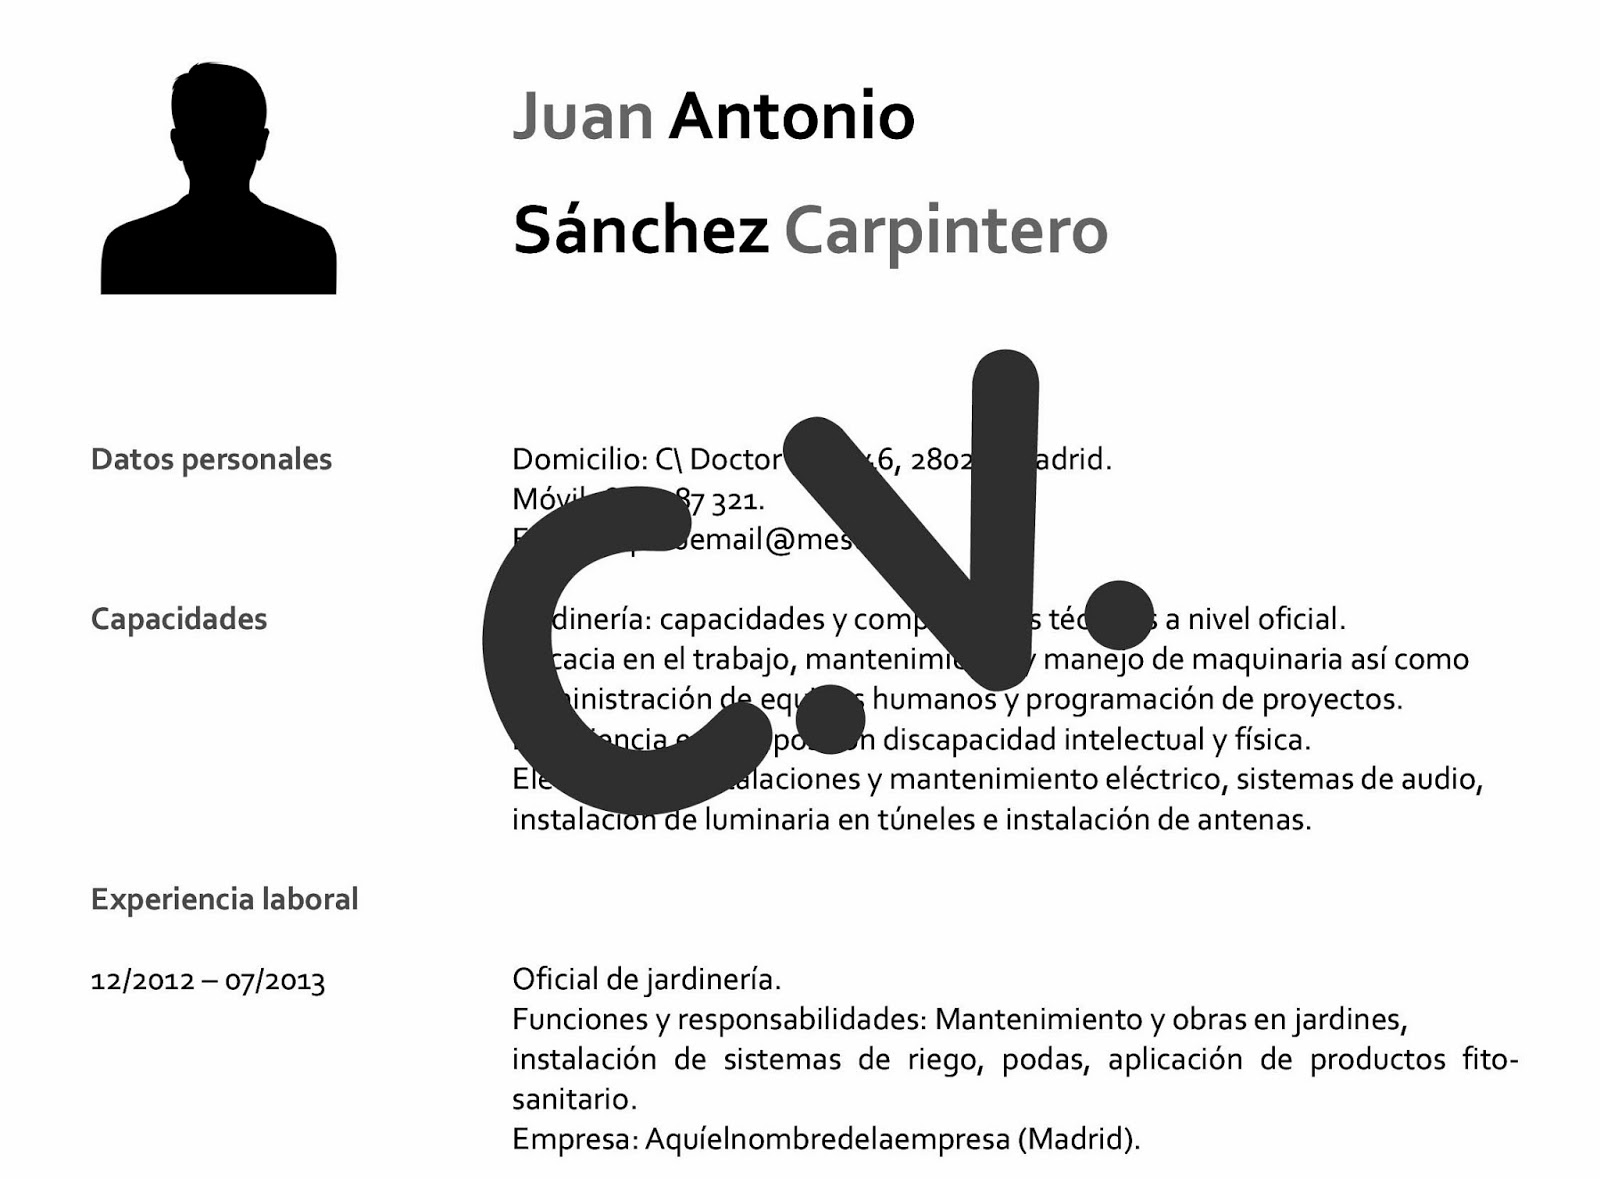 ASPA-BLOG: El Currículum Vitae